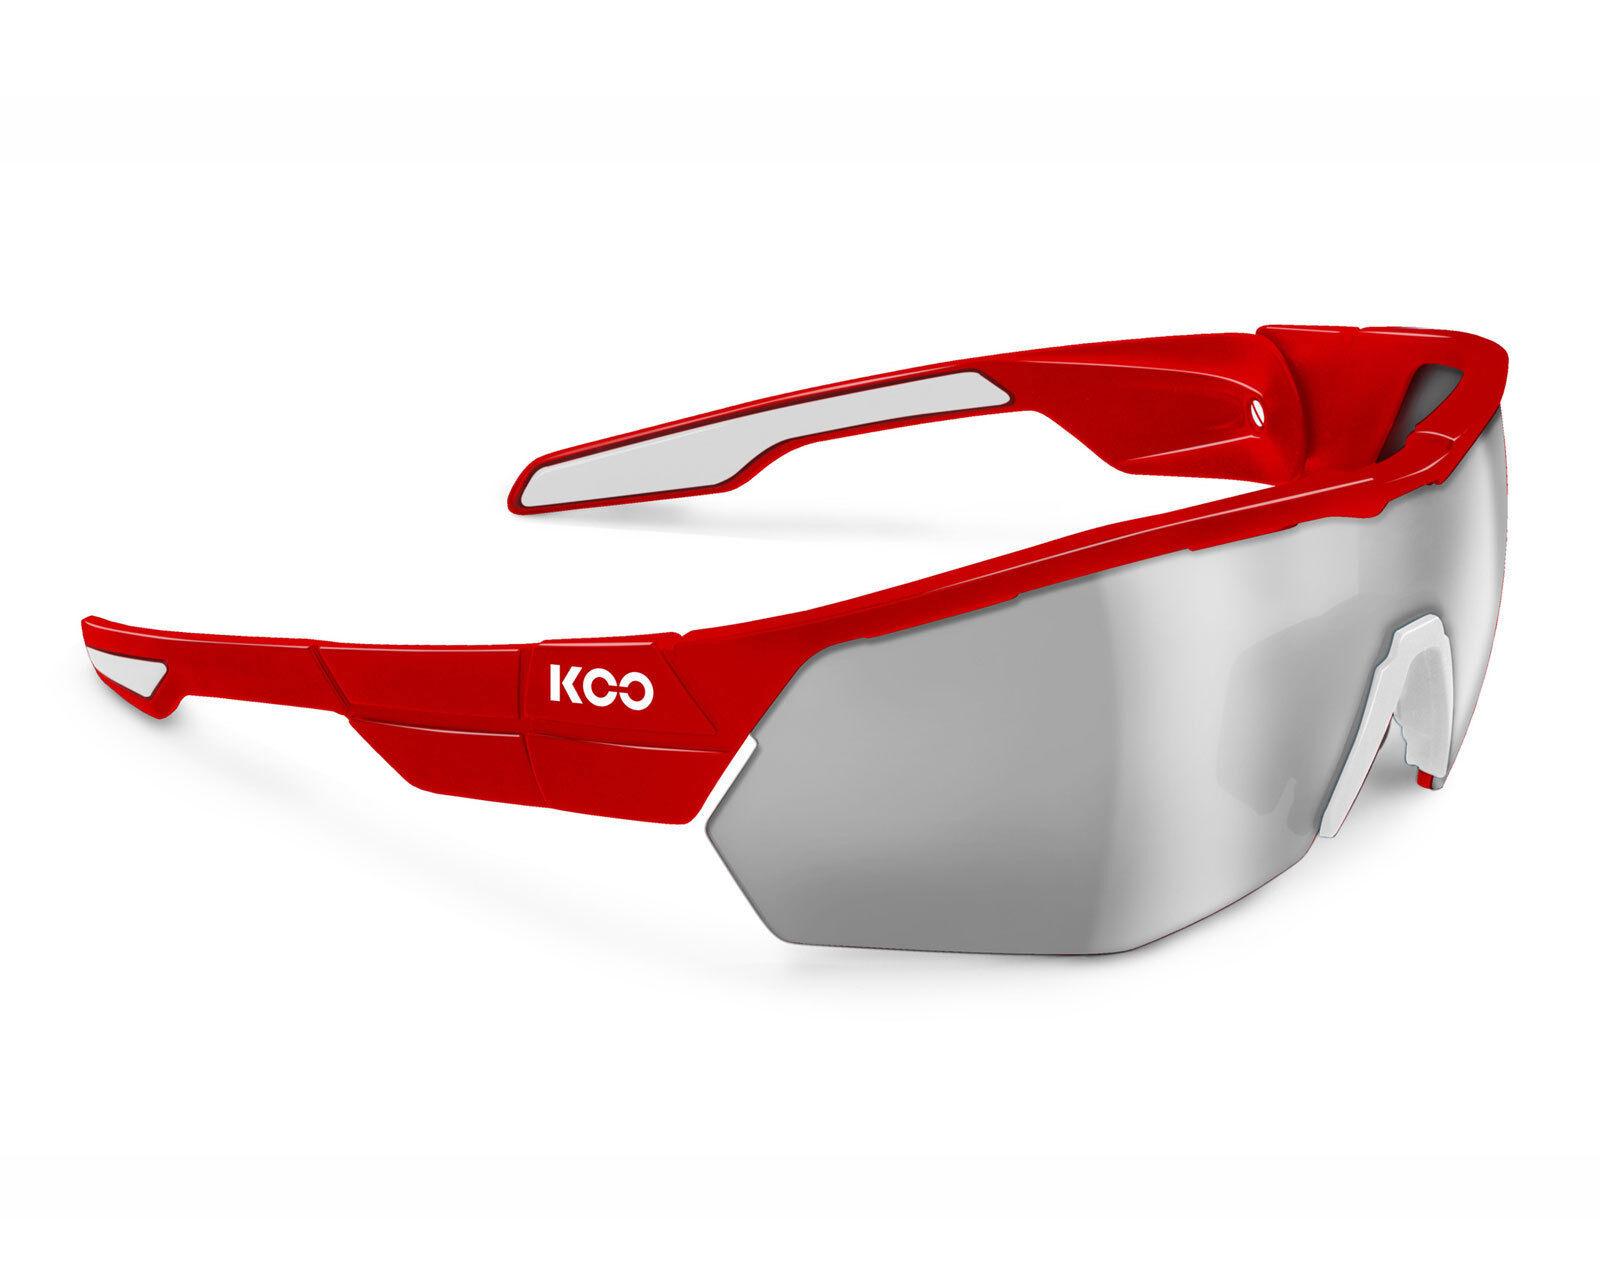 KOO OPEN CUBE Sunglasses Asian Fit - rouge